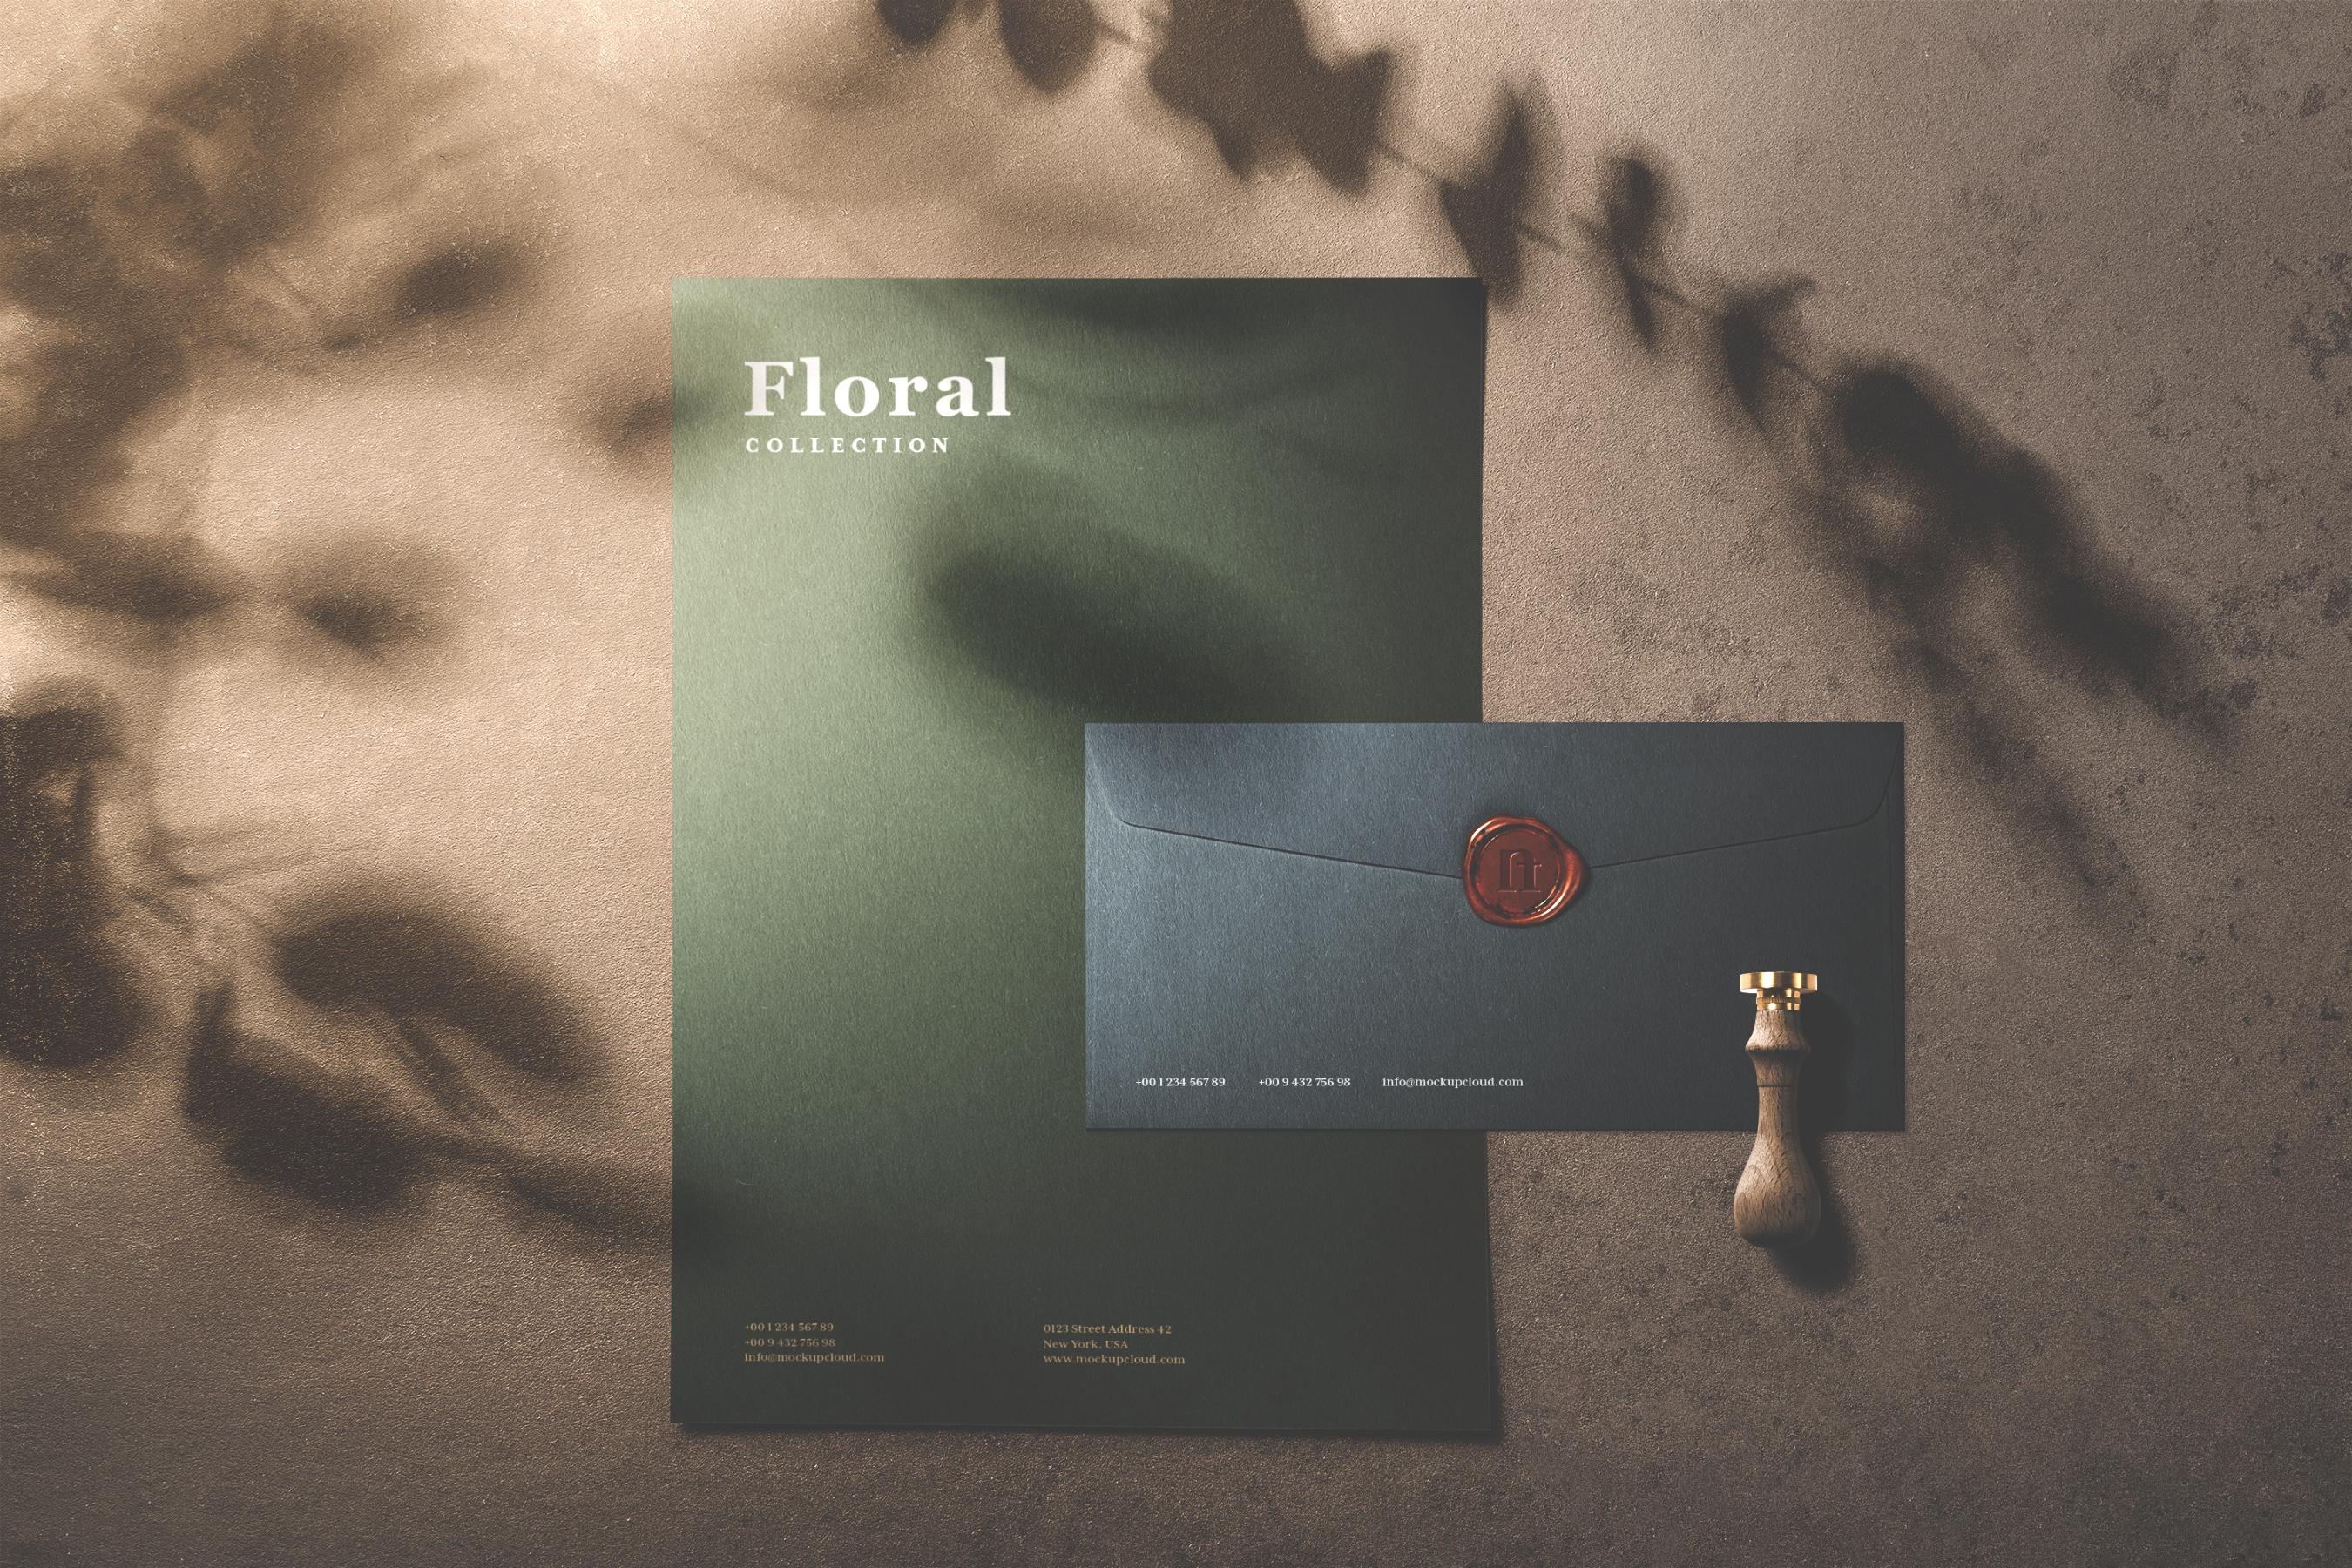 15 floral premade scene